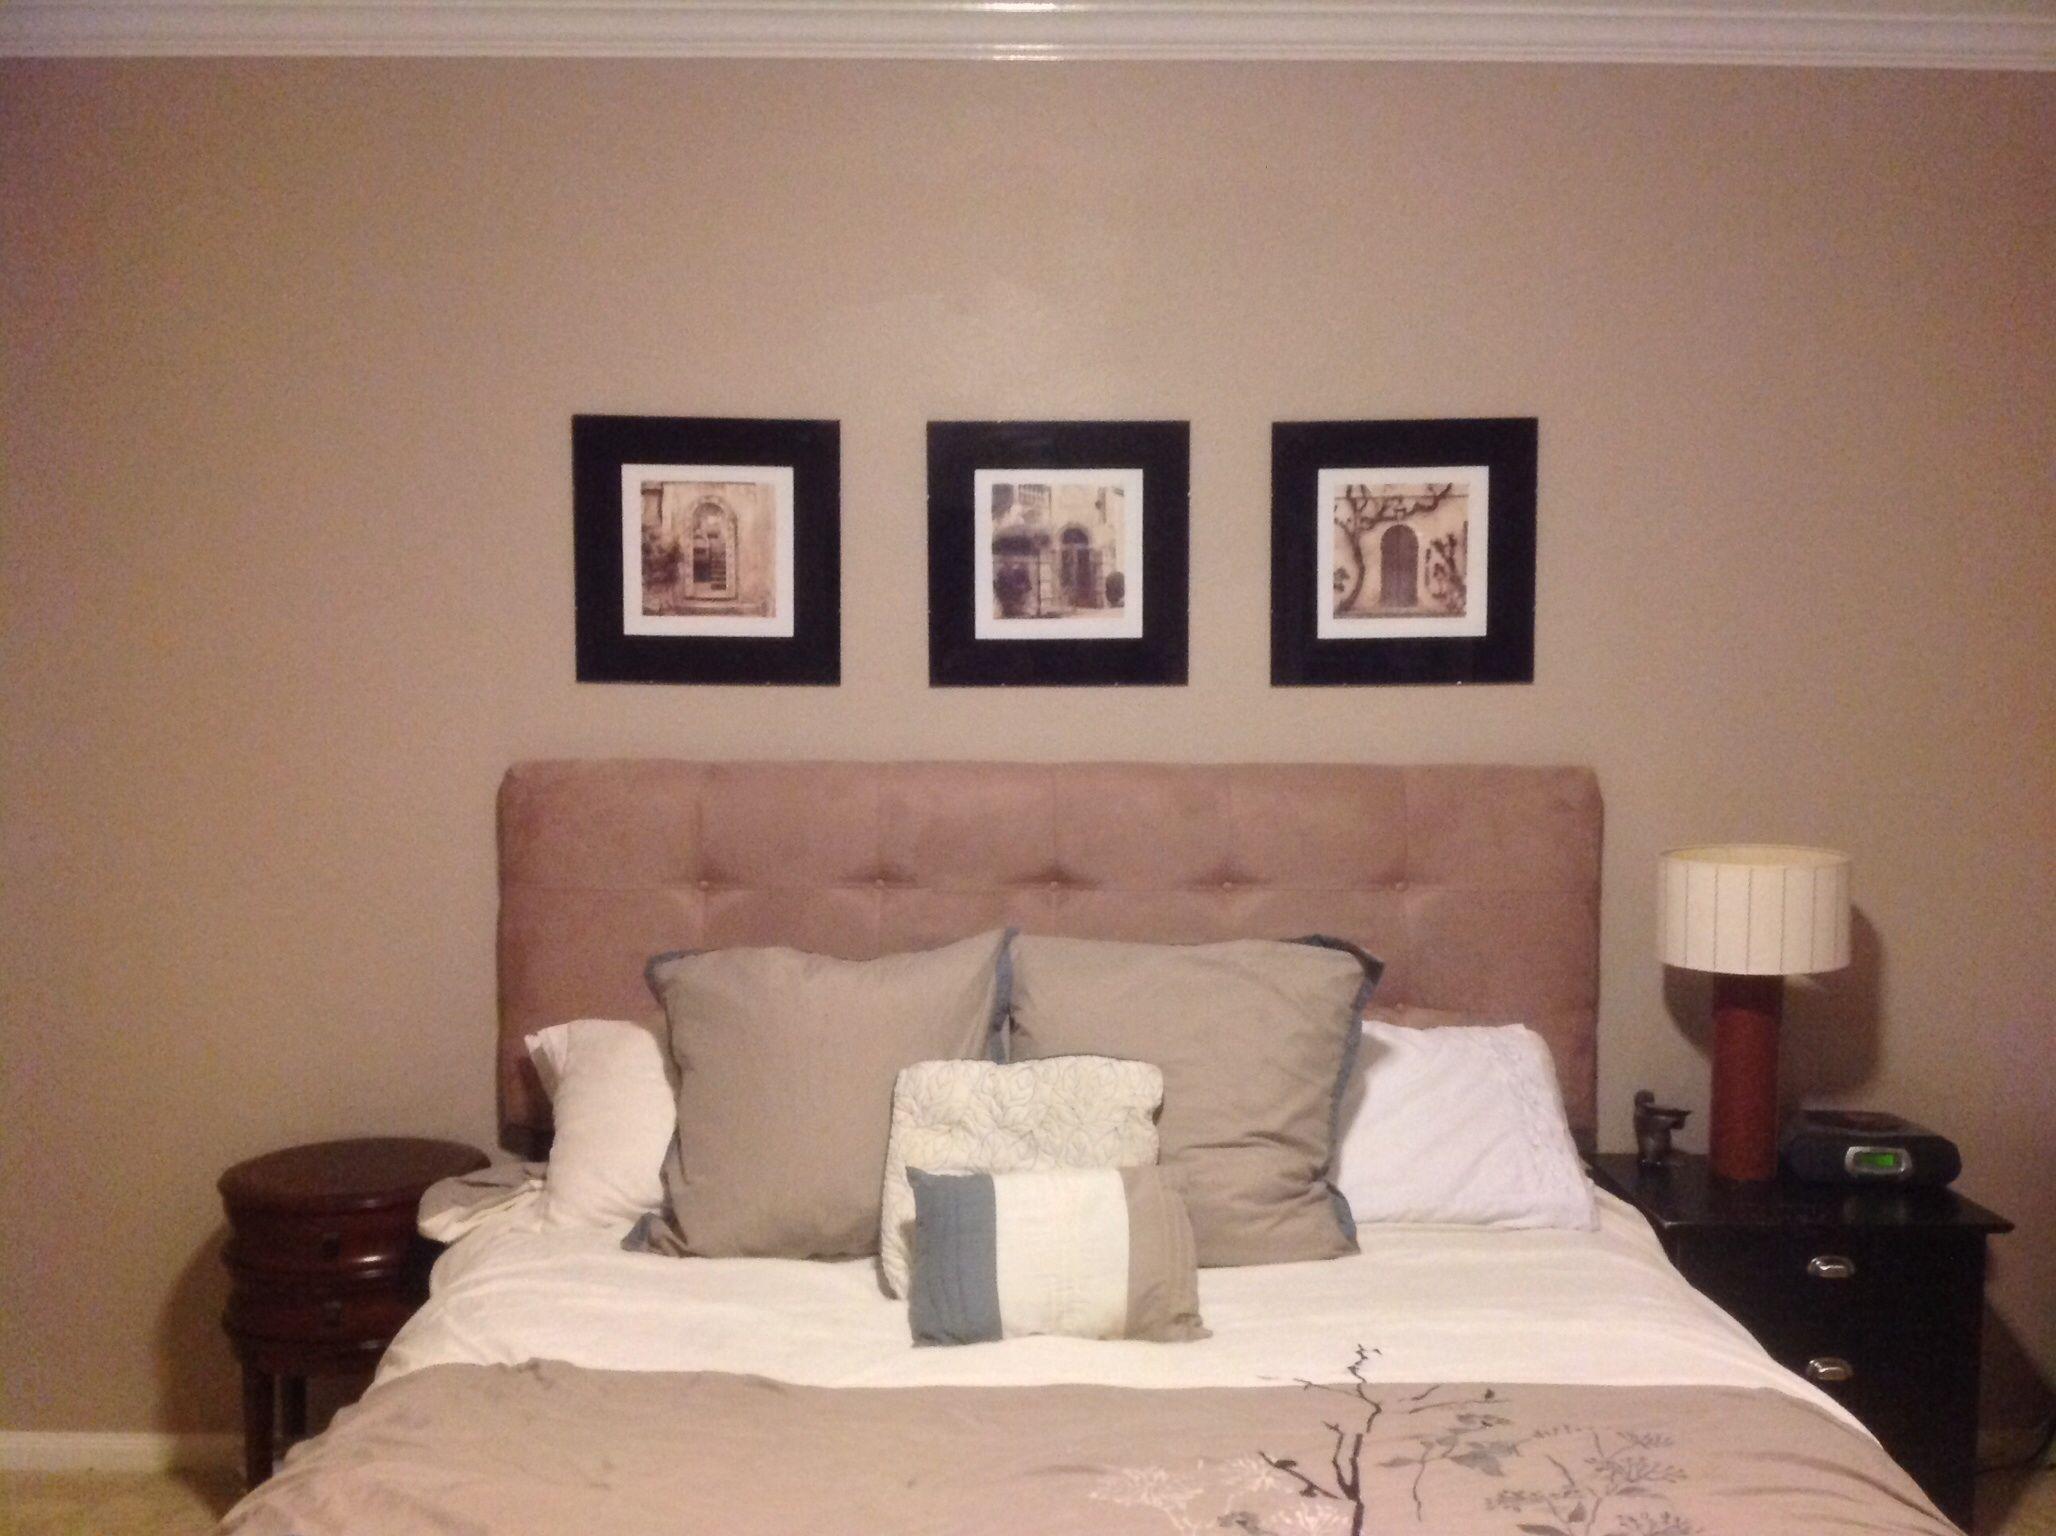 Valspar rocky bluffs paint color pinterest home valspar and home decor